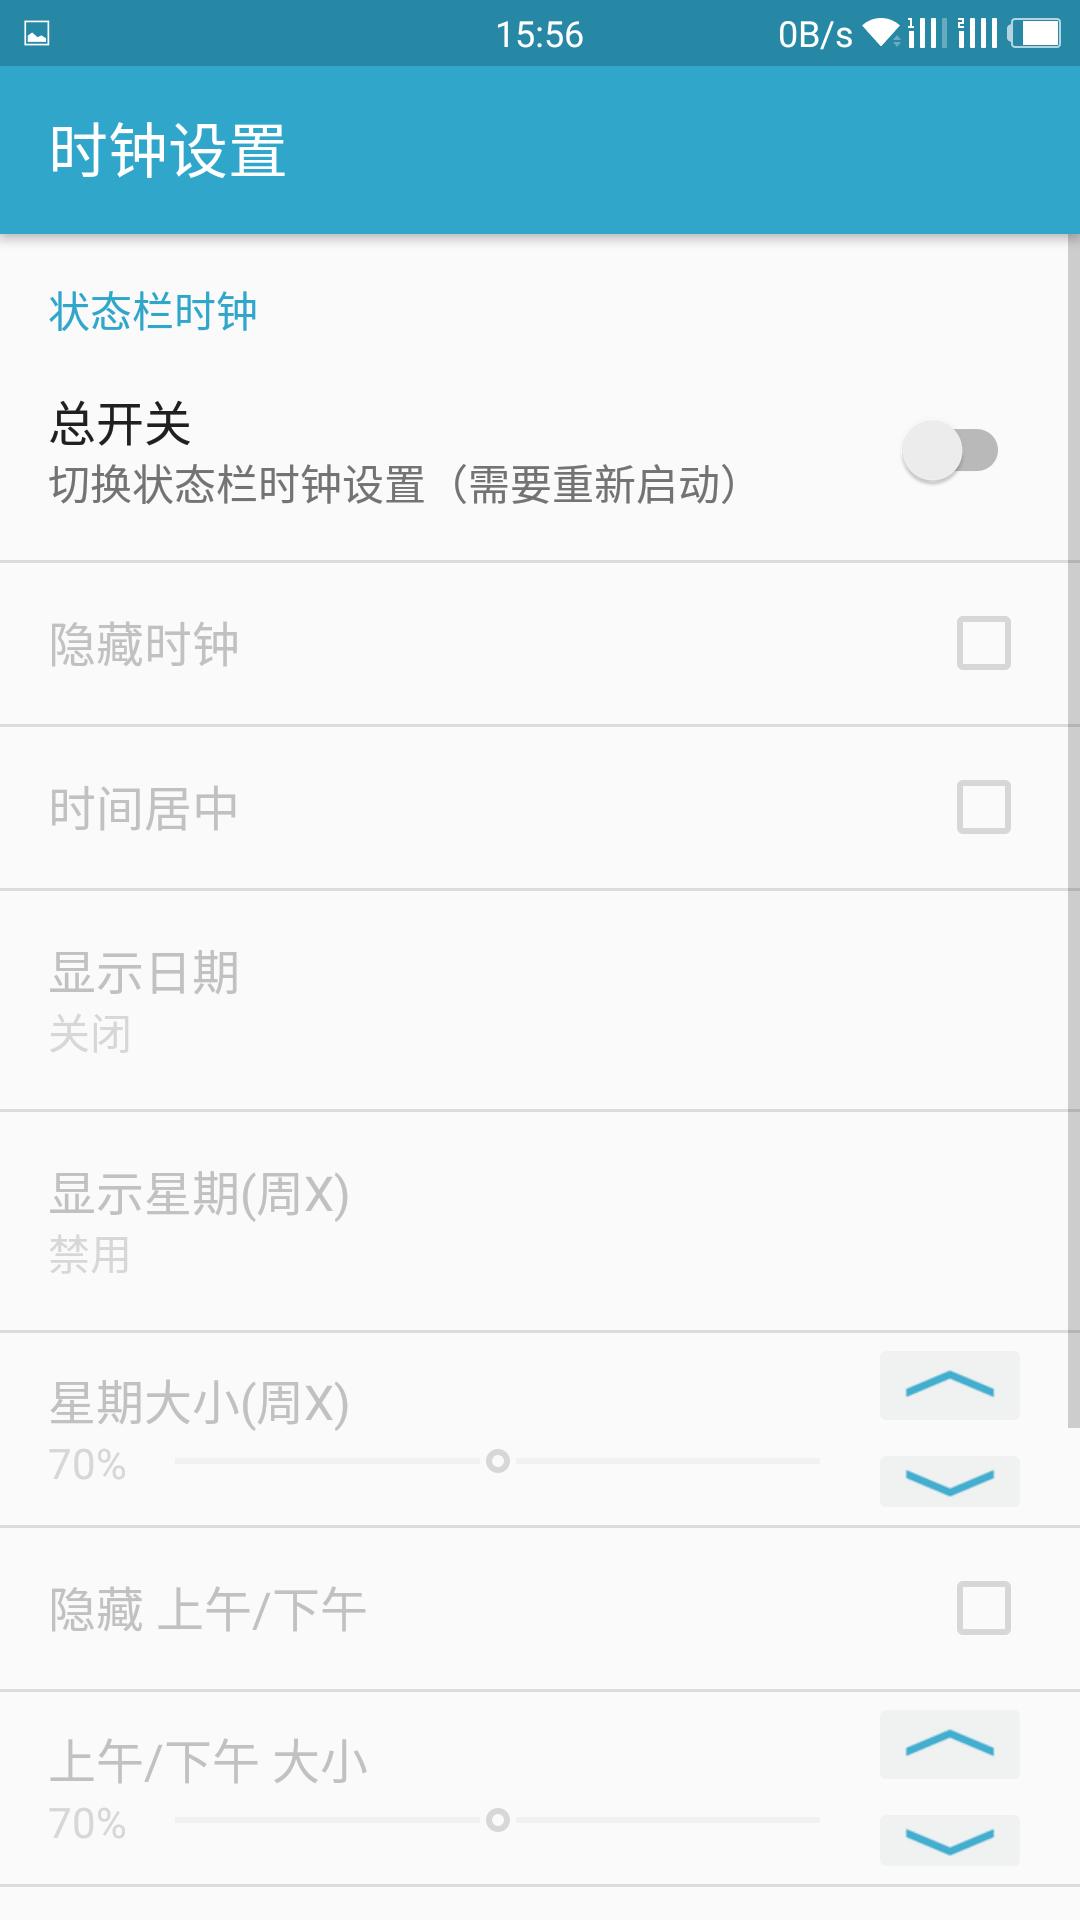 Screenshot_20160208-155651.png